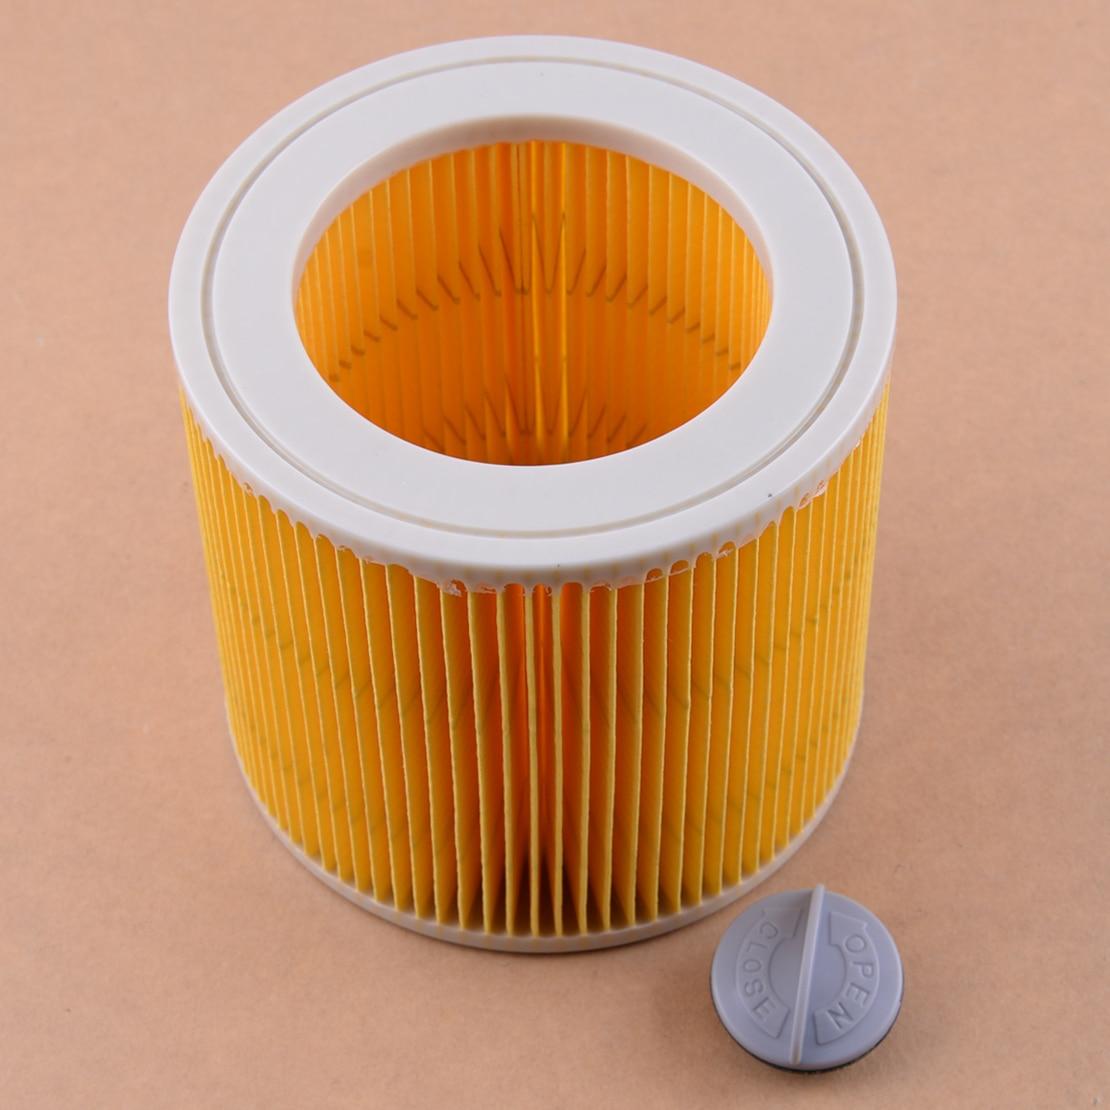 talla 2 Modelador De Color-Taper punto suave punta de marfil